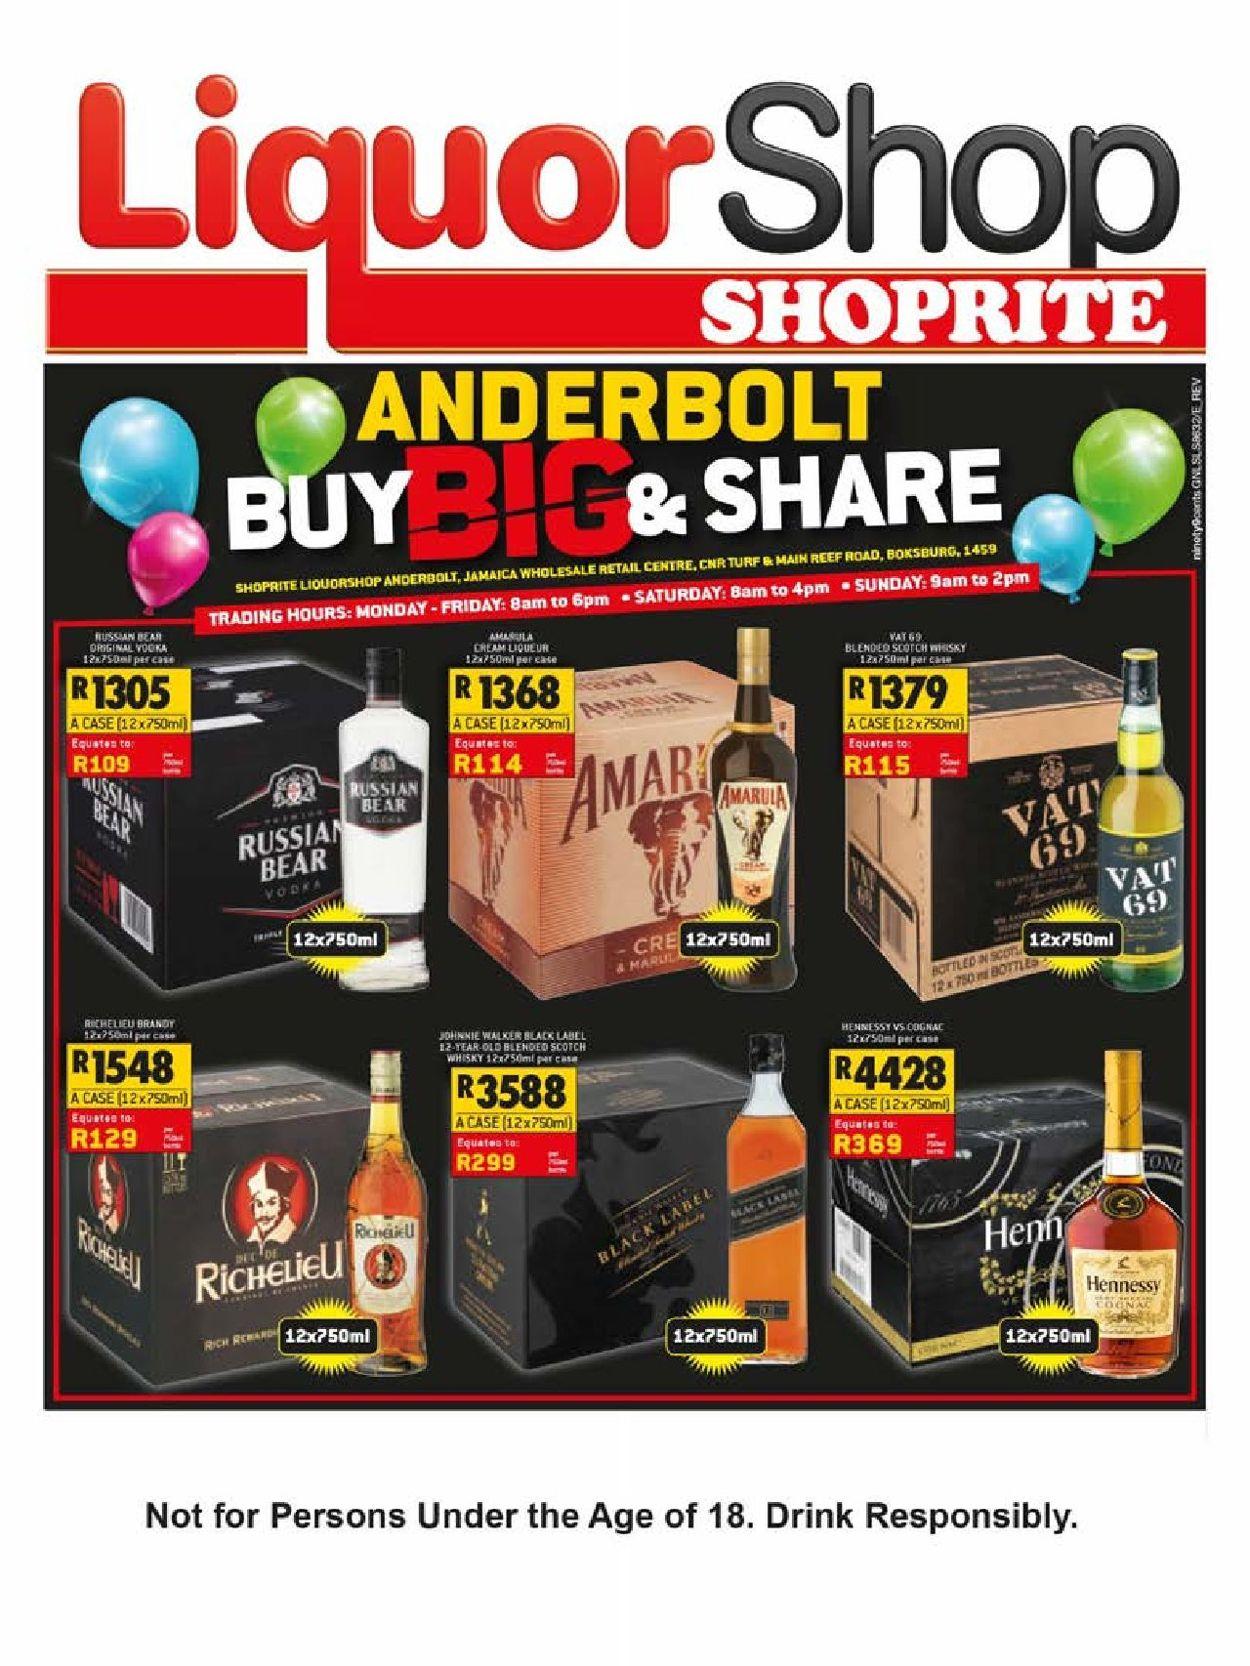 Shoprite Catalogue - 2019/04/15-2019/05/05